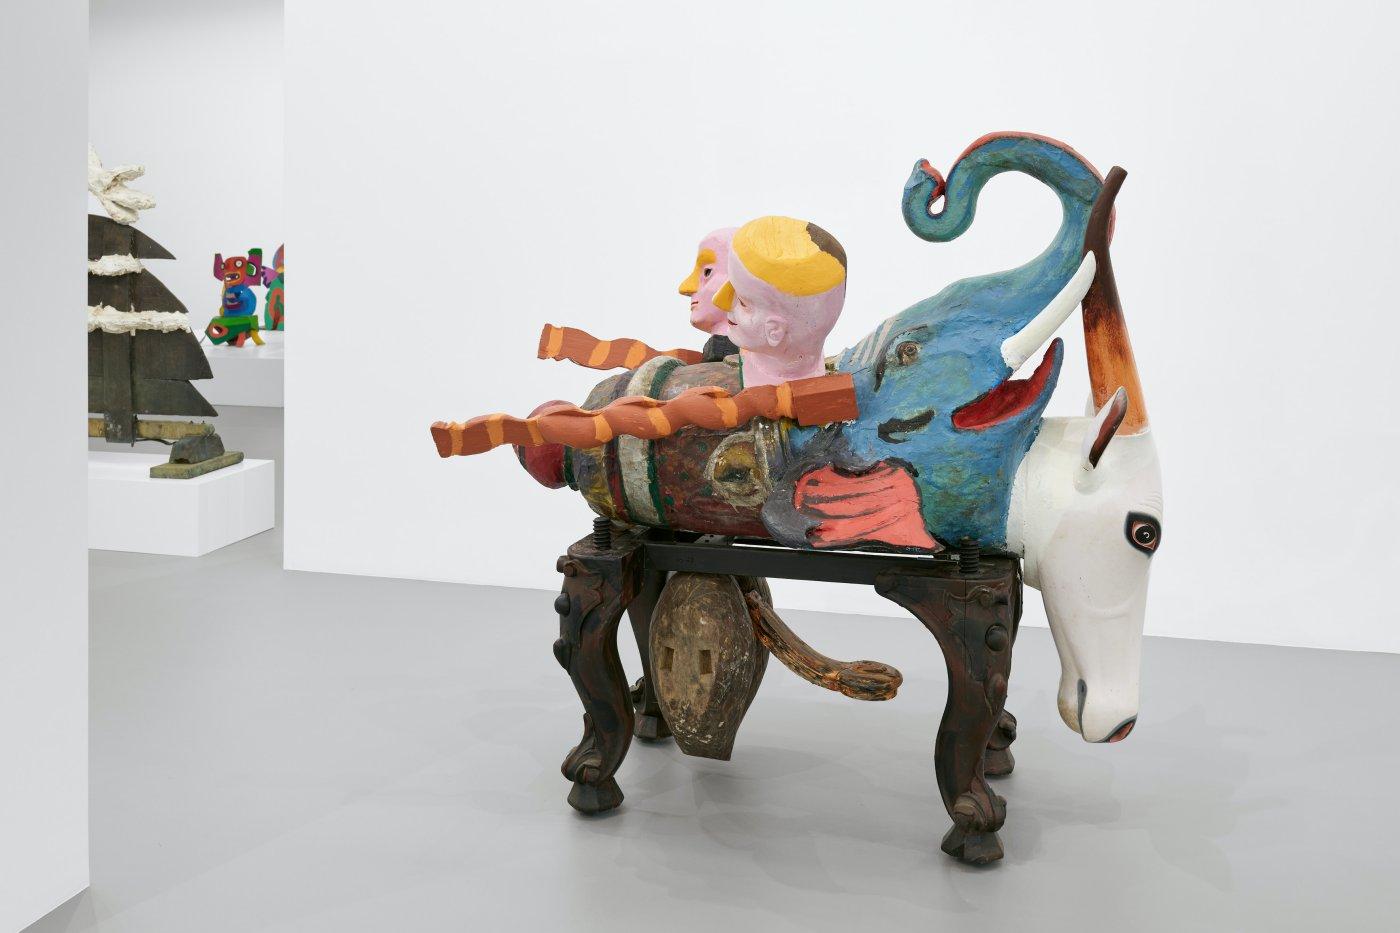 Galerie Max Hetzler Goethestrasse Karel Appel 15